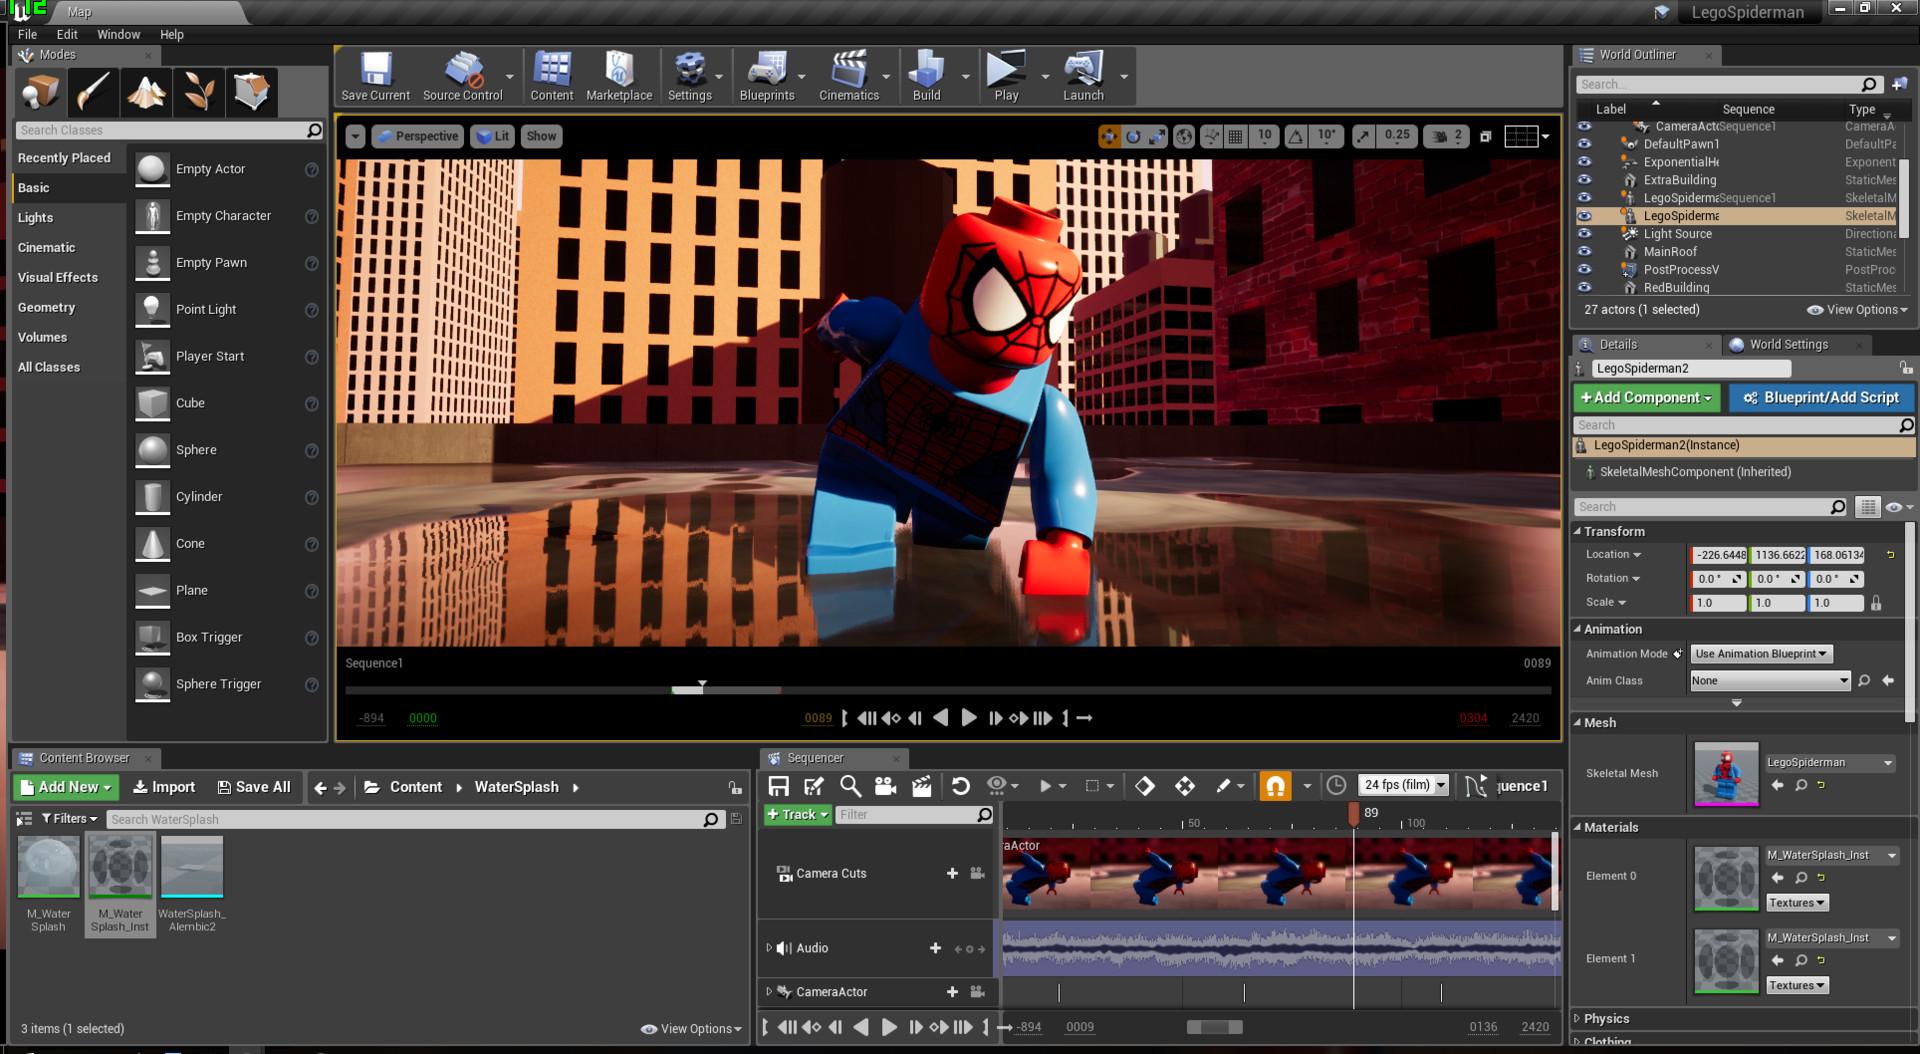 Ue4 Animations